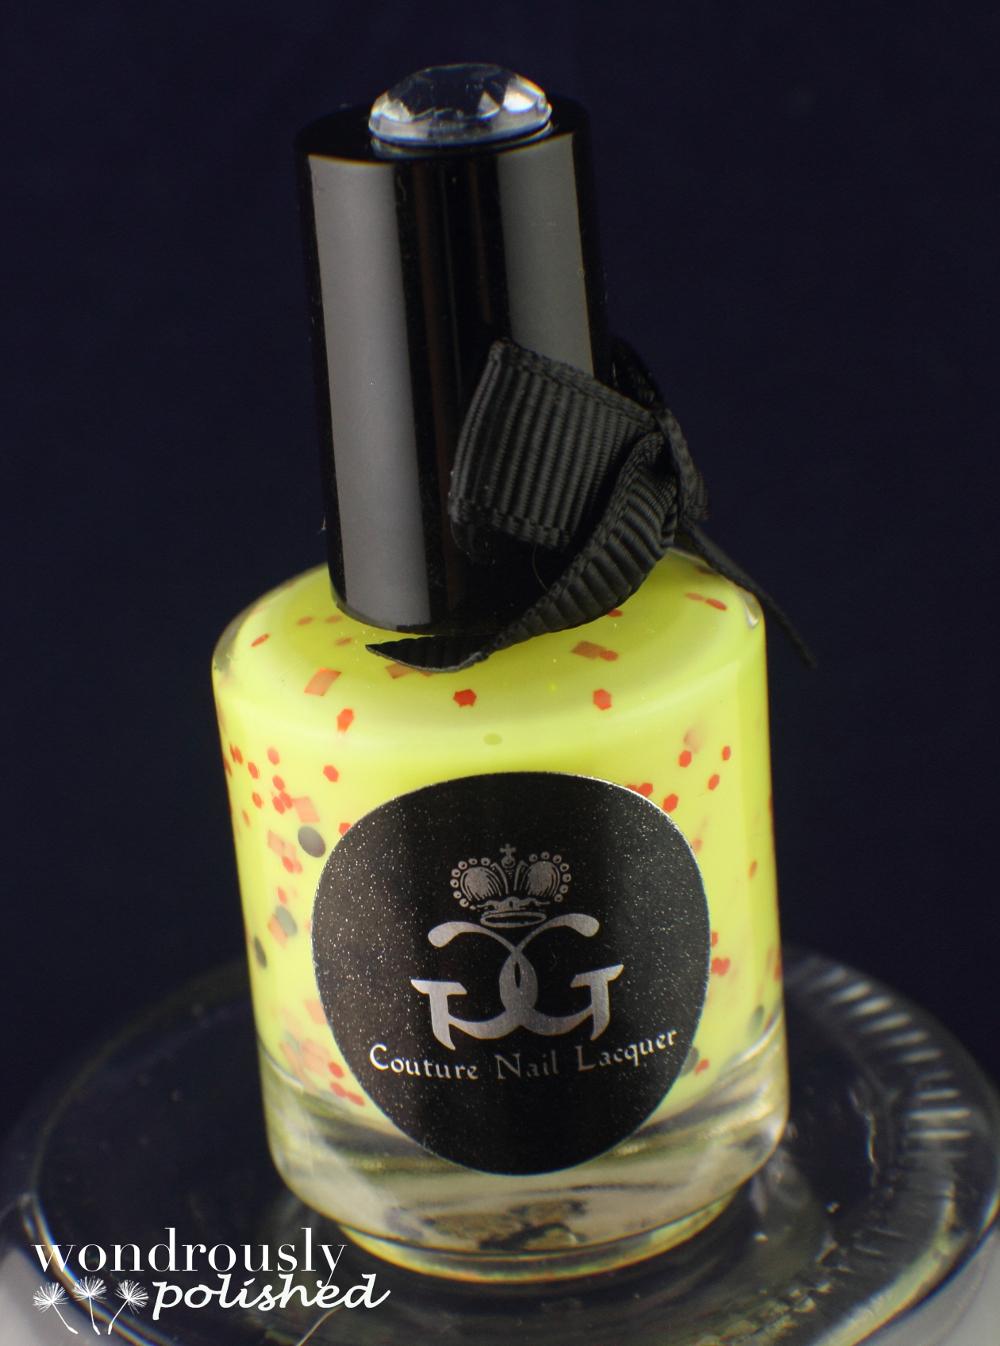 Wondrously Polished April Nail Art Challenge: Wondrously Polished: GG Couture Nail Lacquer Giveaway